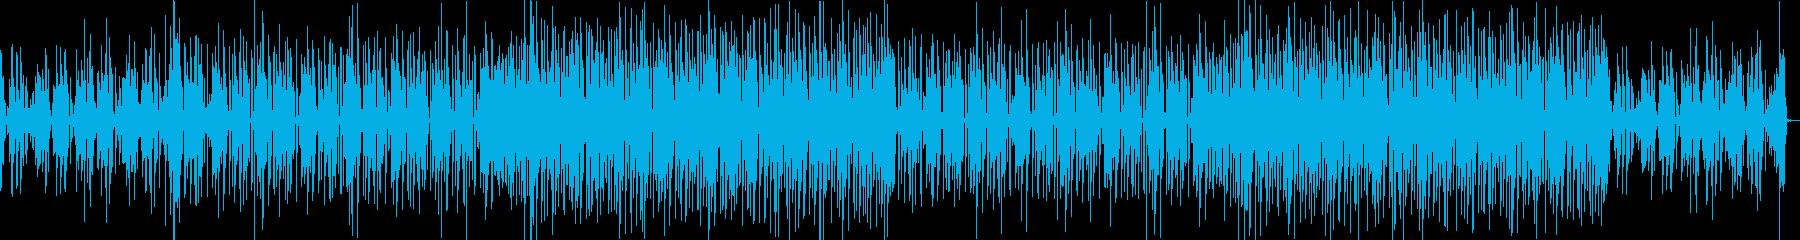 Twice風なKpopサウンドの再生済みの波形